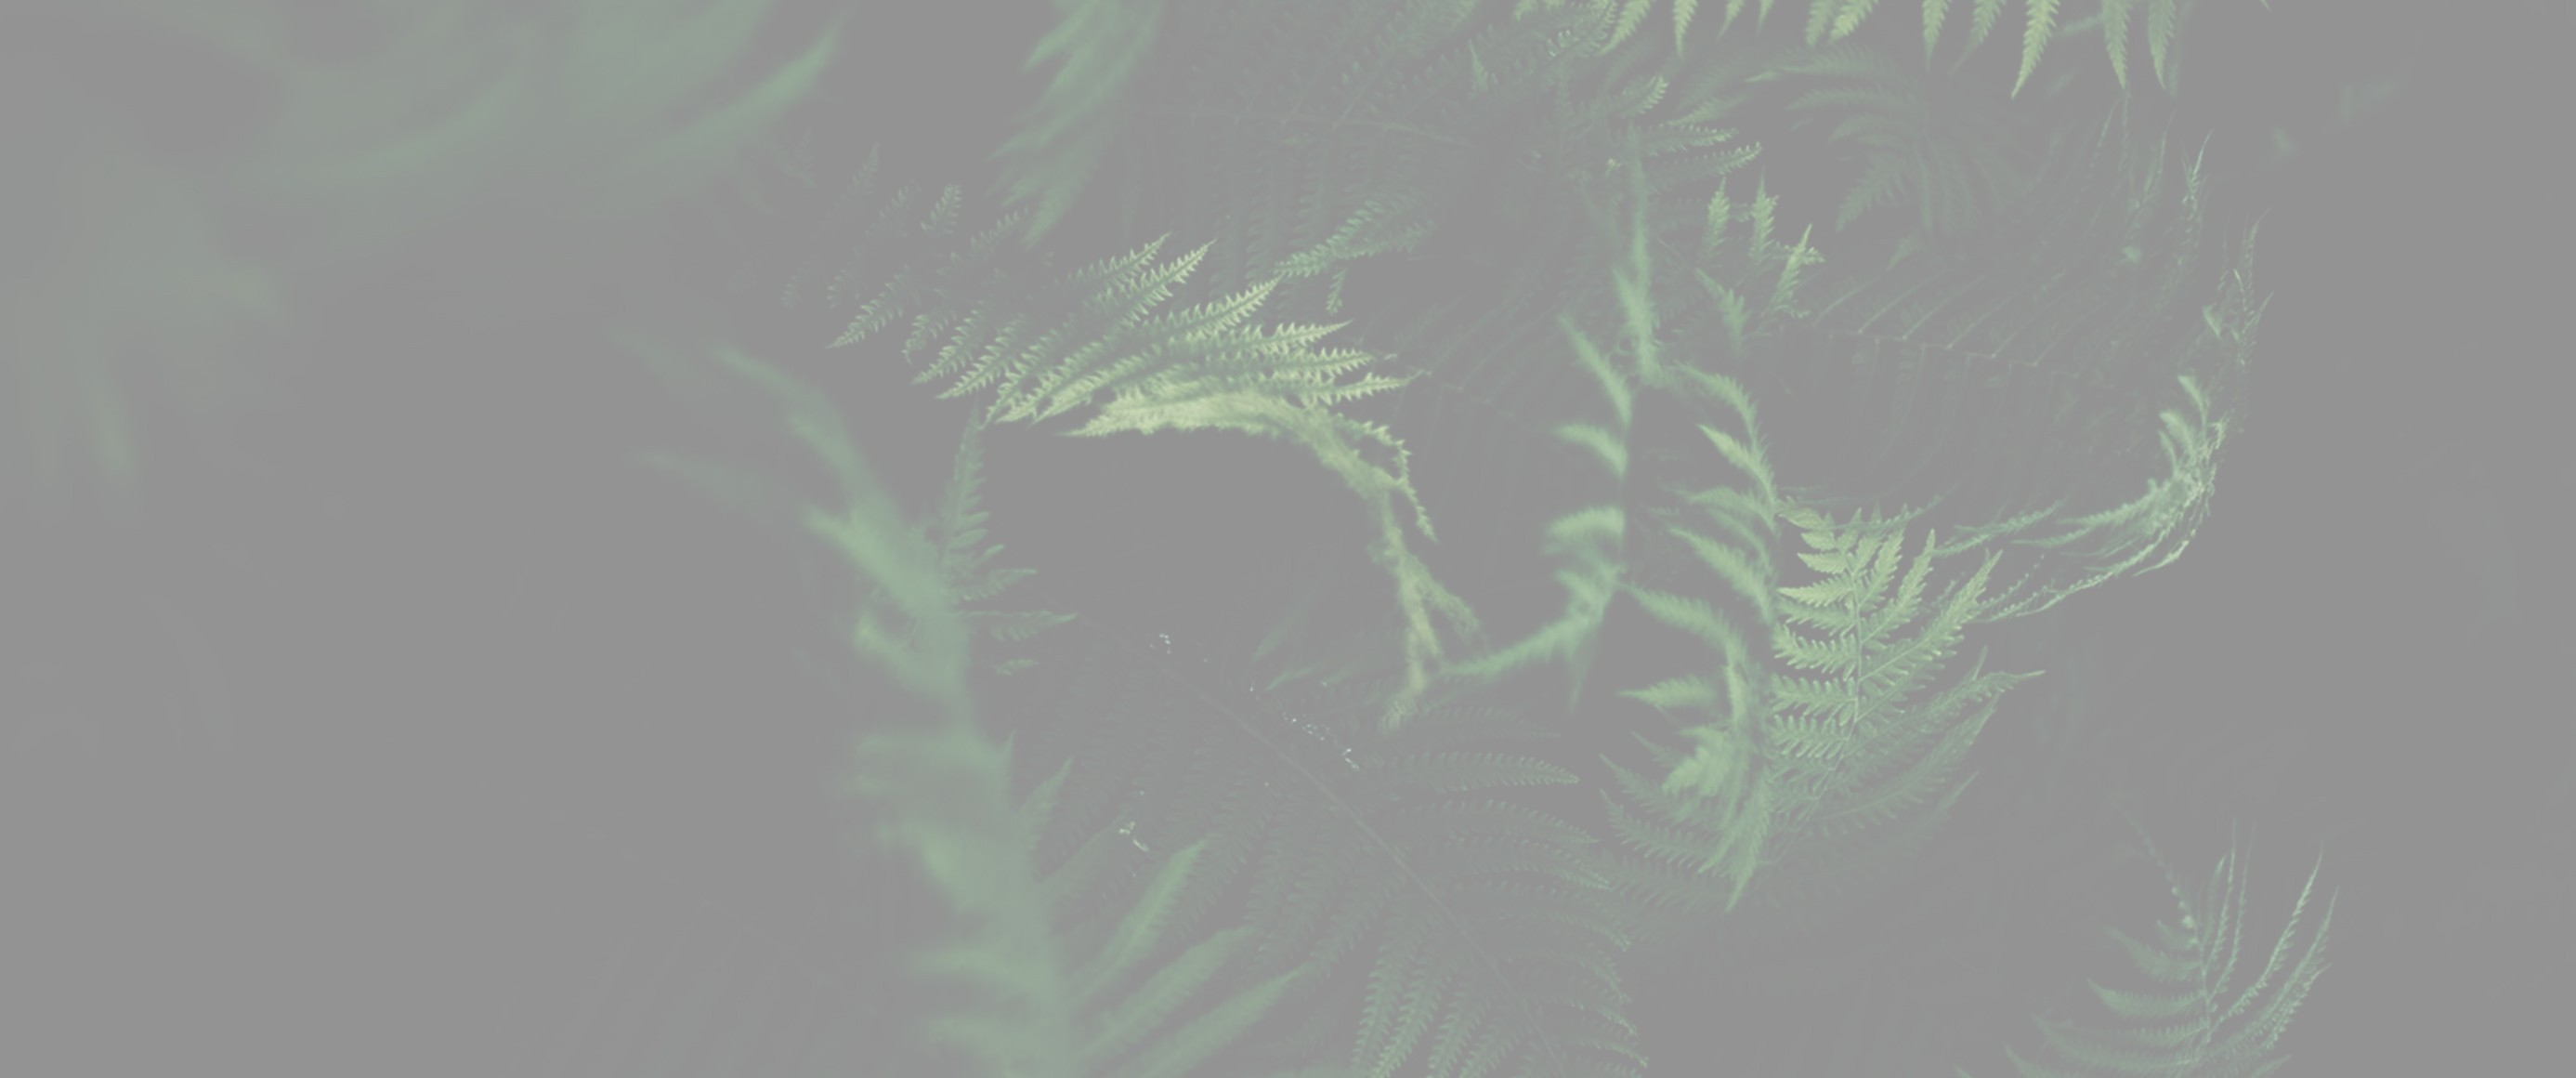 Venator Recruitment | LinkedIn